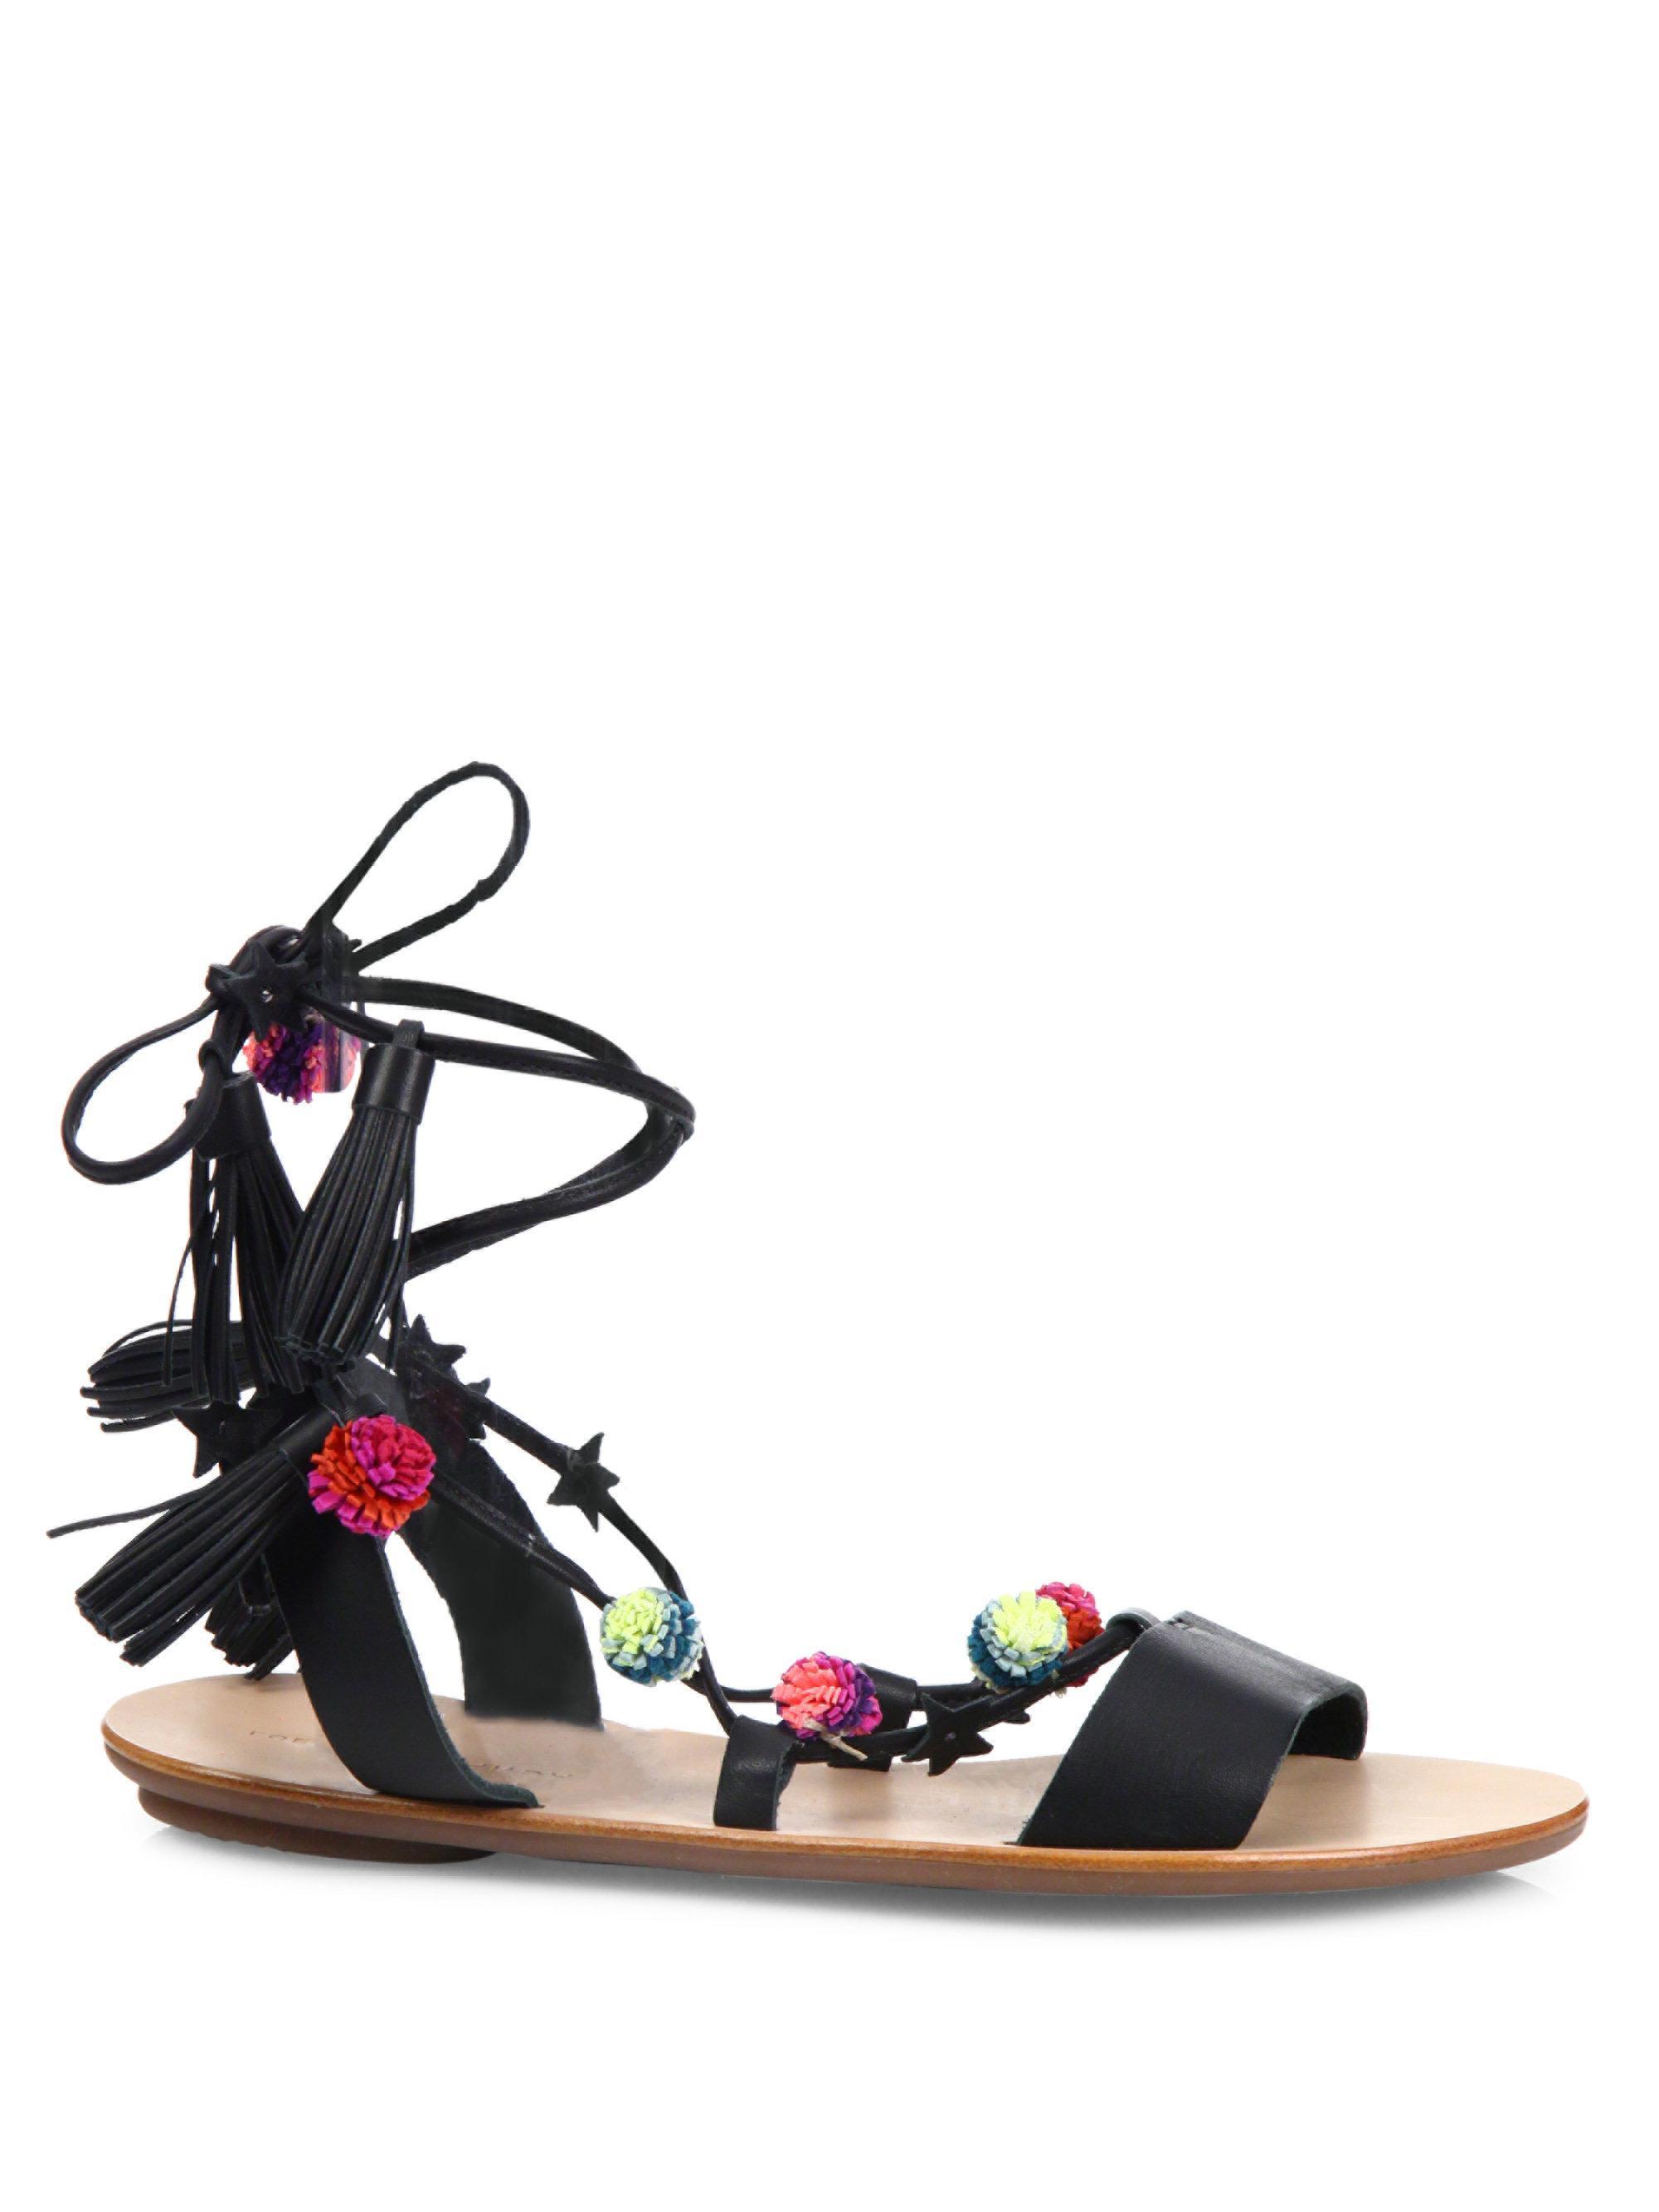 Loeffler Randall - Black Suze Pom-pom Leather Ankle-wrap Sandals - Lyst.  View fullscreen